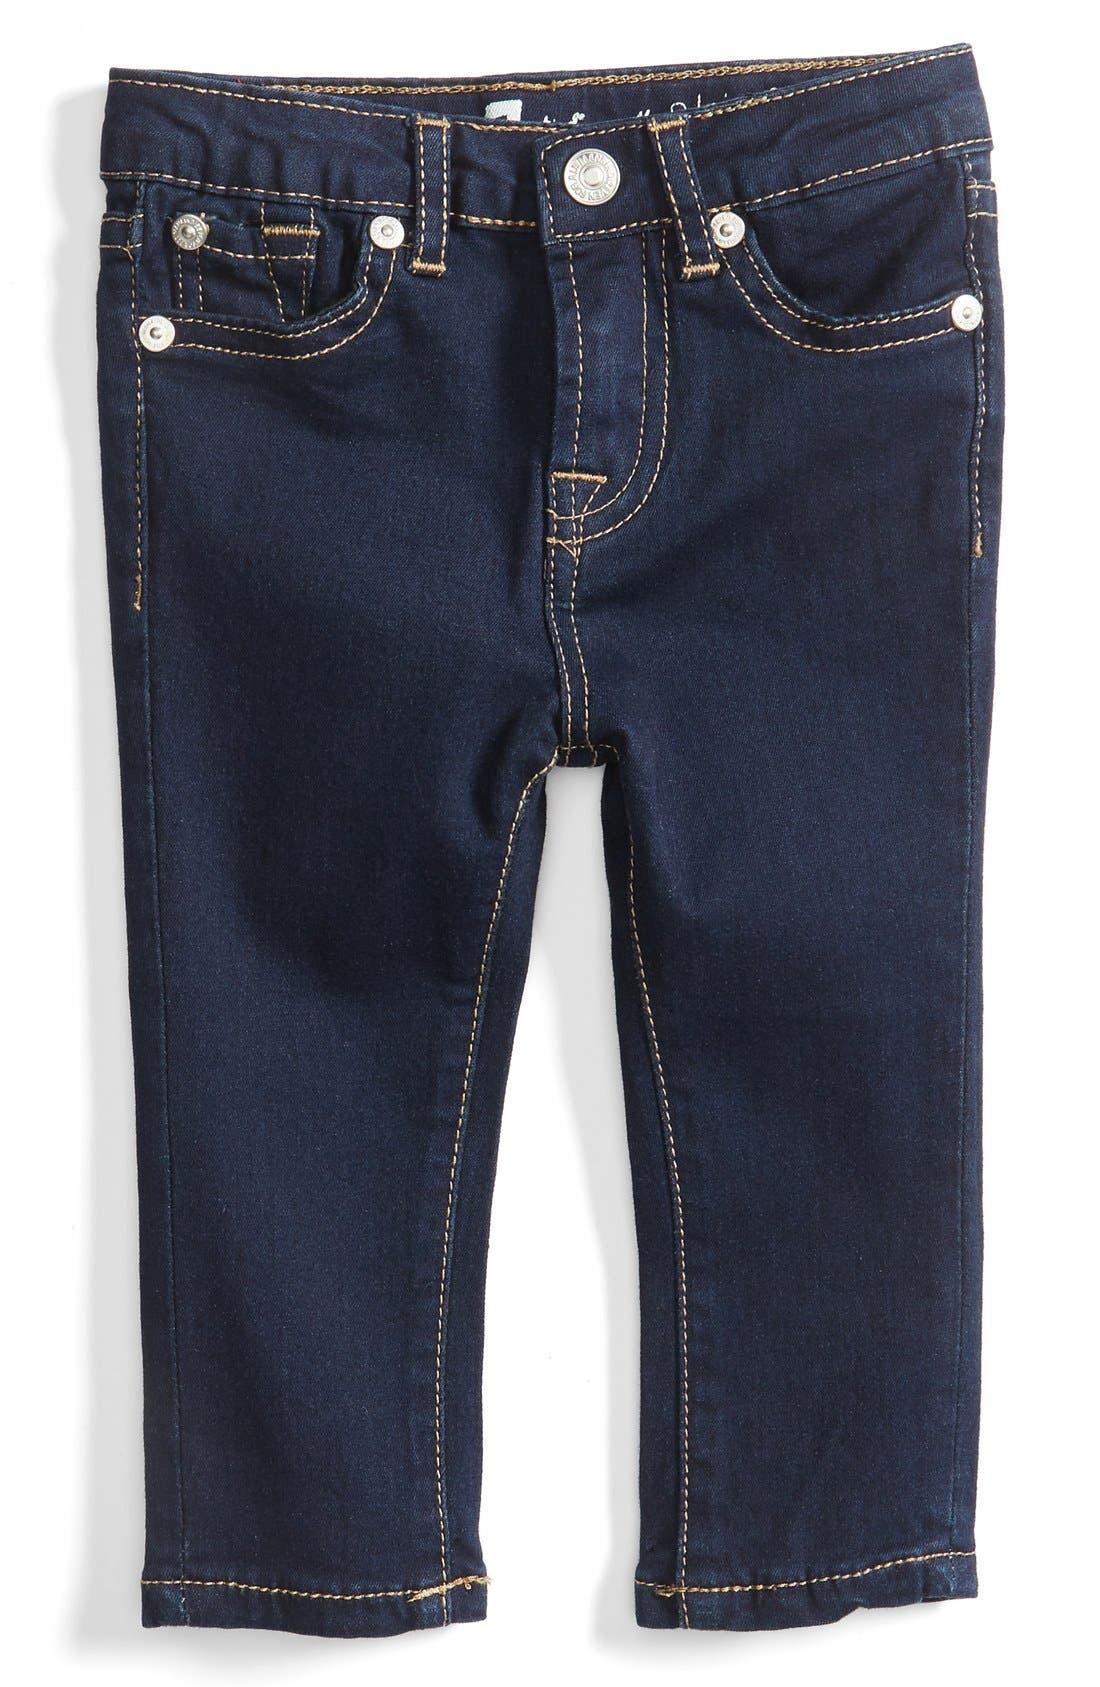 Skinny Fit Jeans,                         Main,                         color, Rinse Indigo